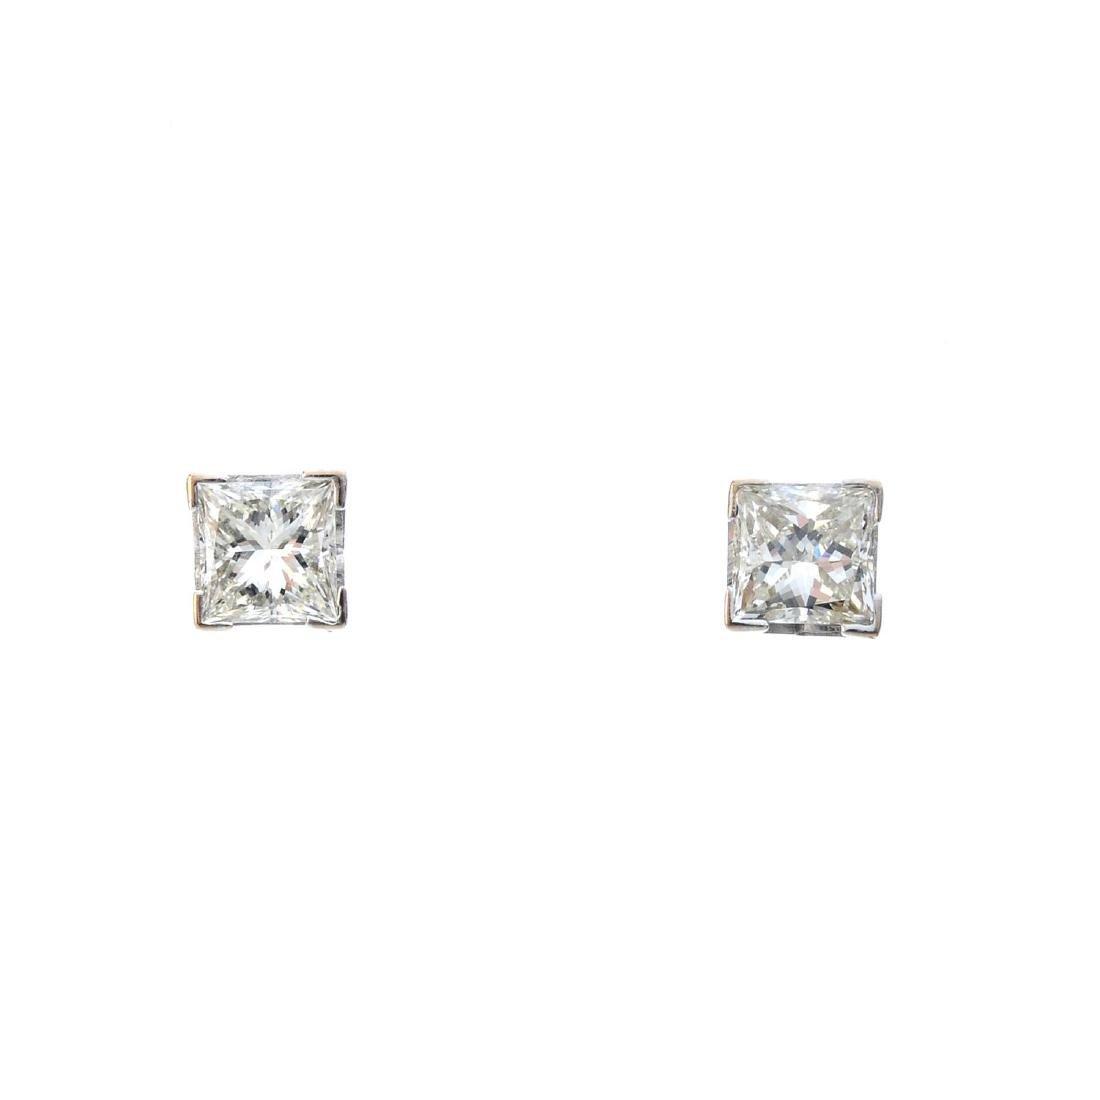 A pair of square-shape diamond stud earrings. Estimated